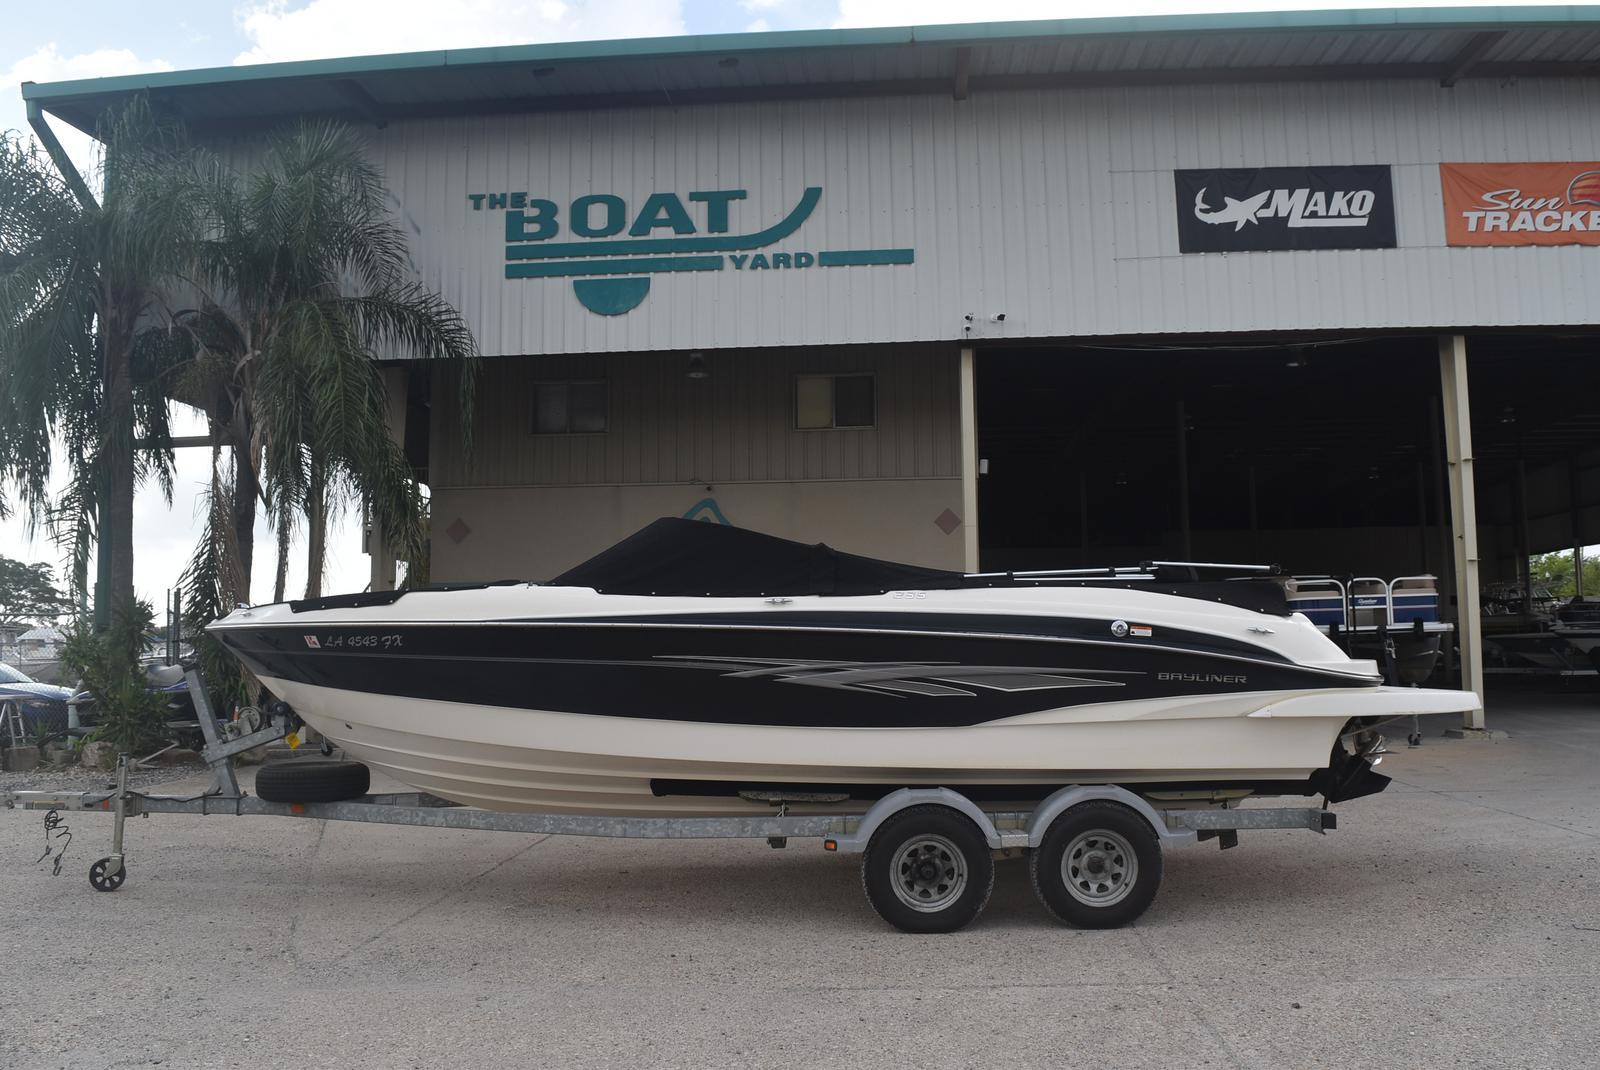 2010 Bayliner boat for sale, model of the boat is 235BR & Image # 1 of 43